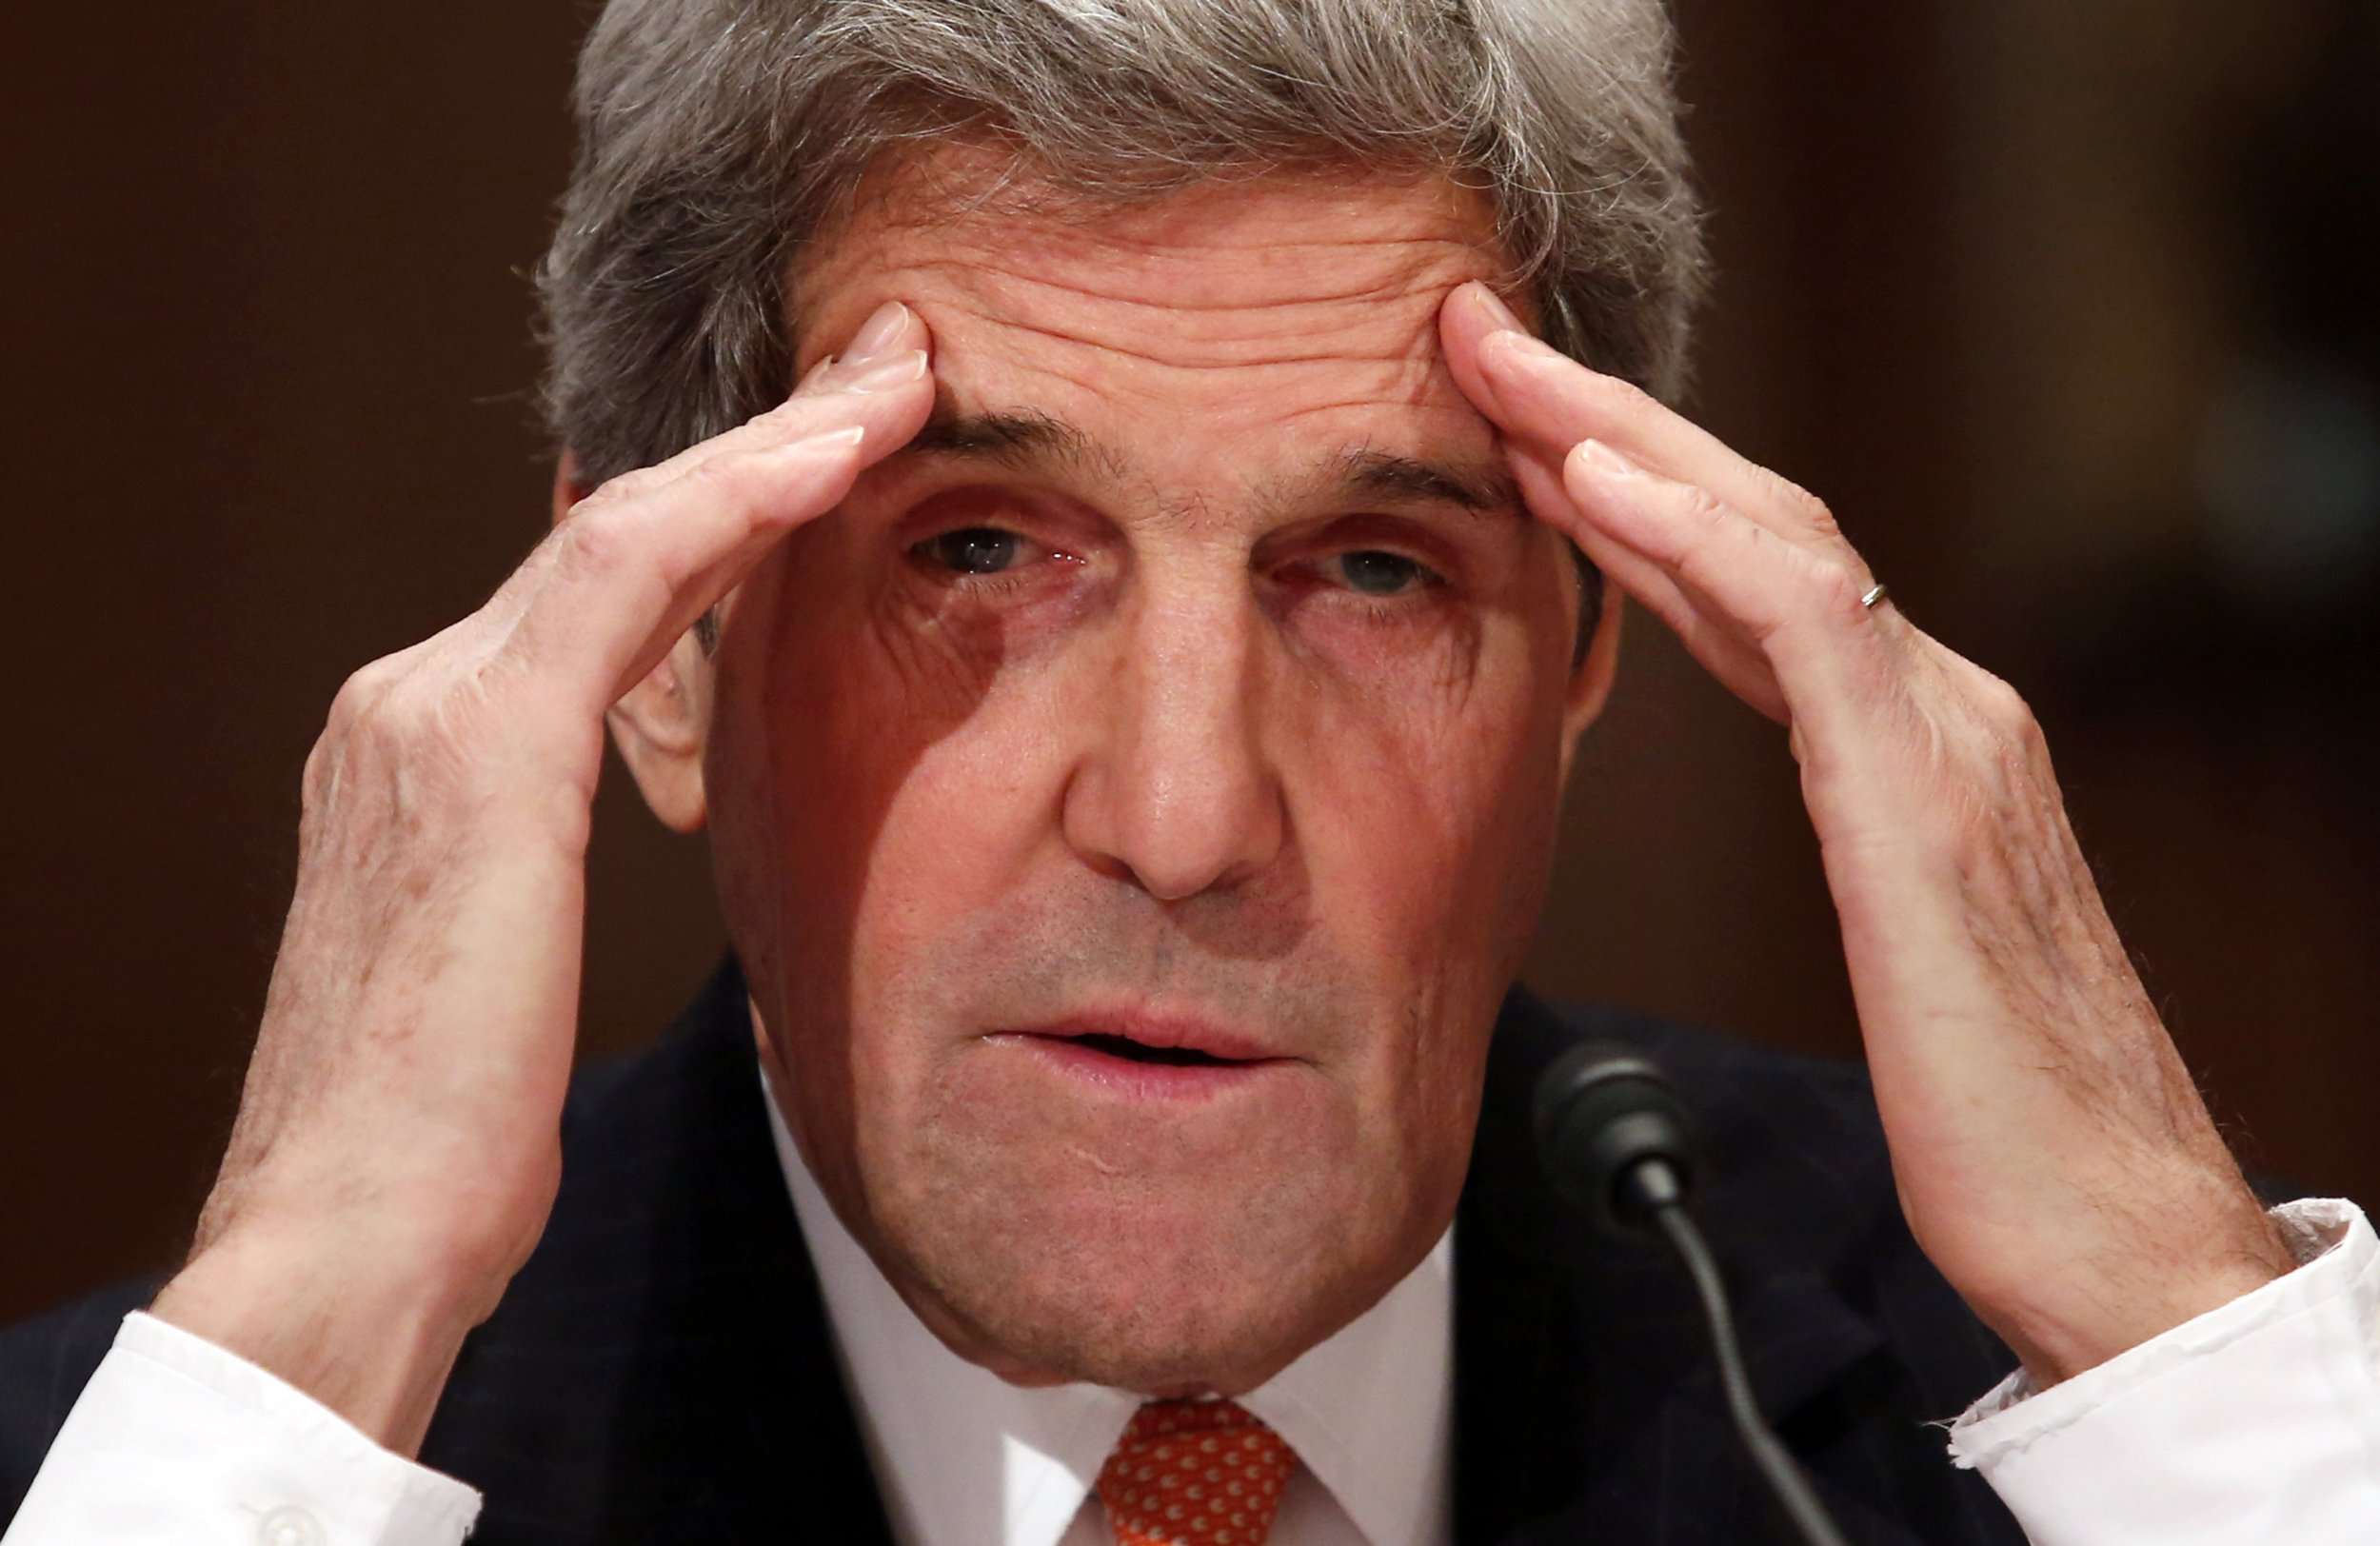 Military career of John Kerry